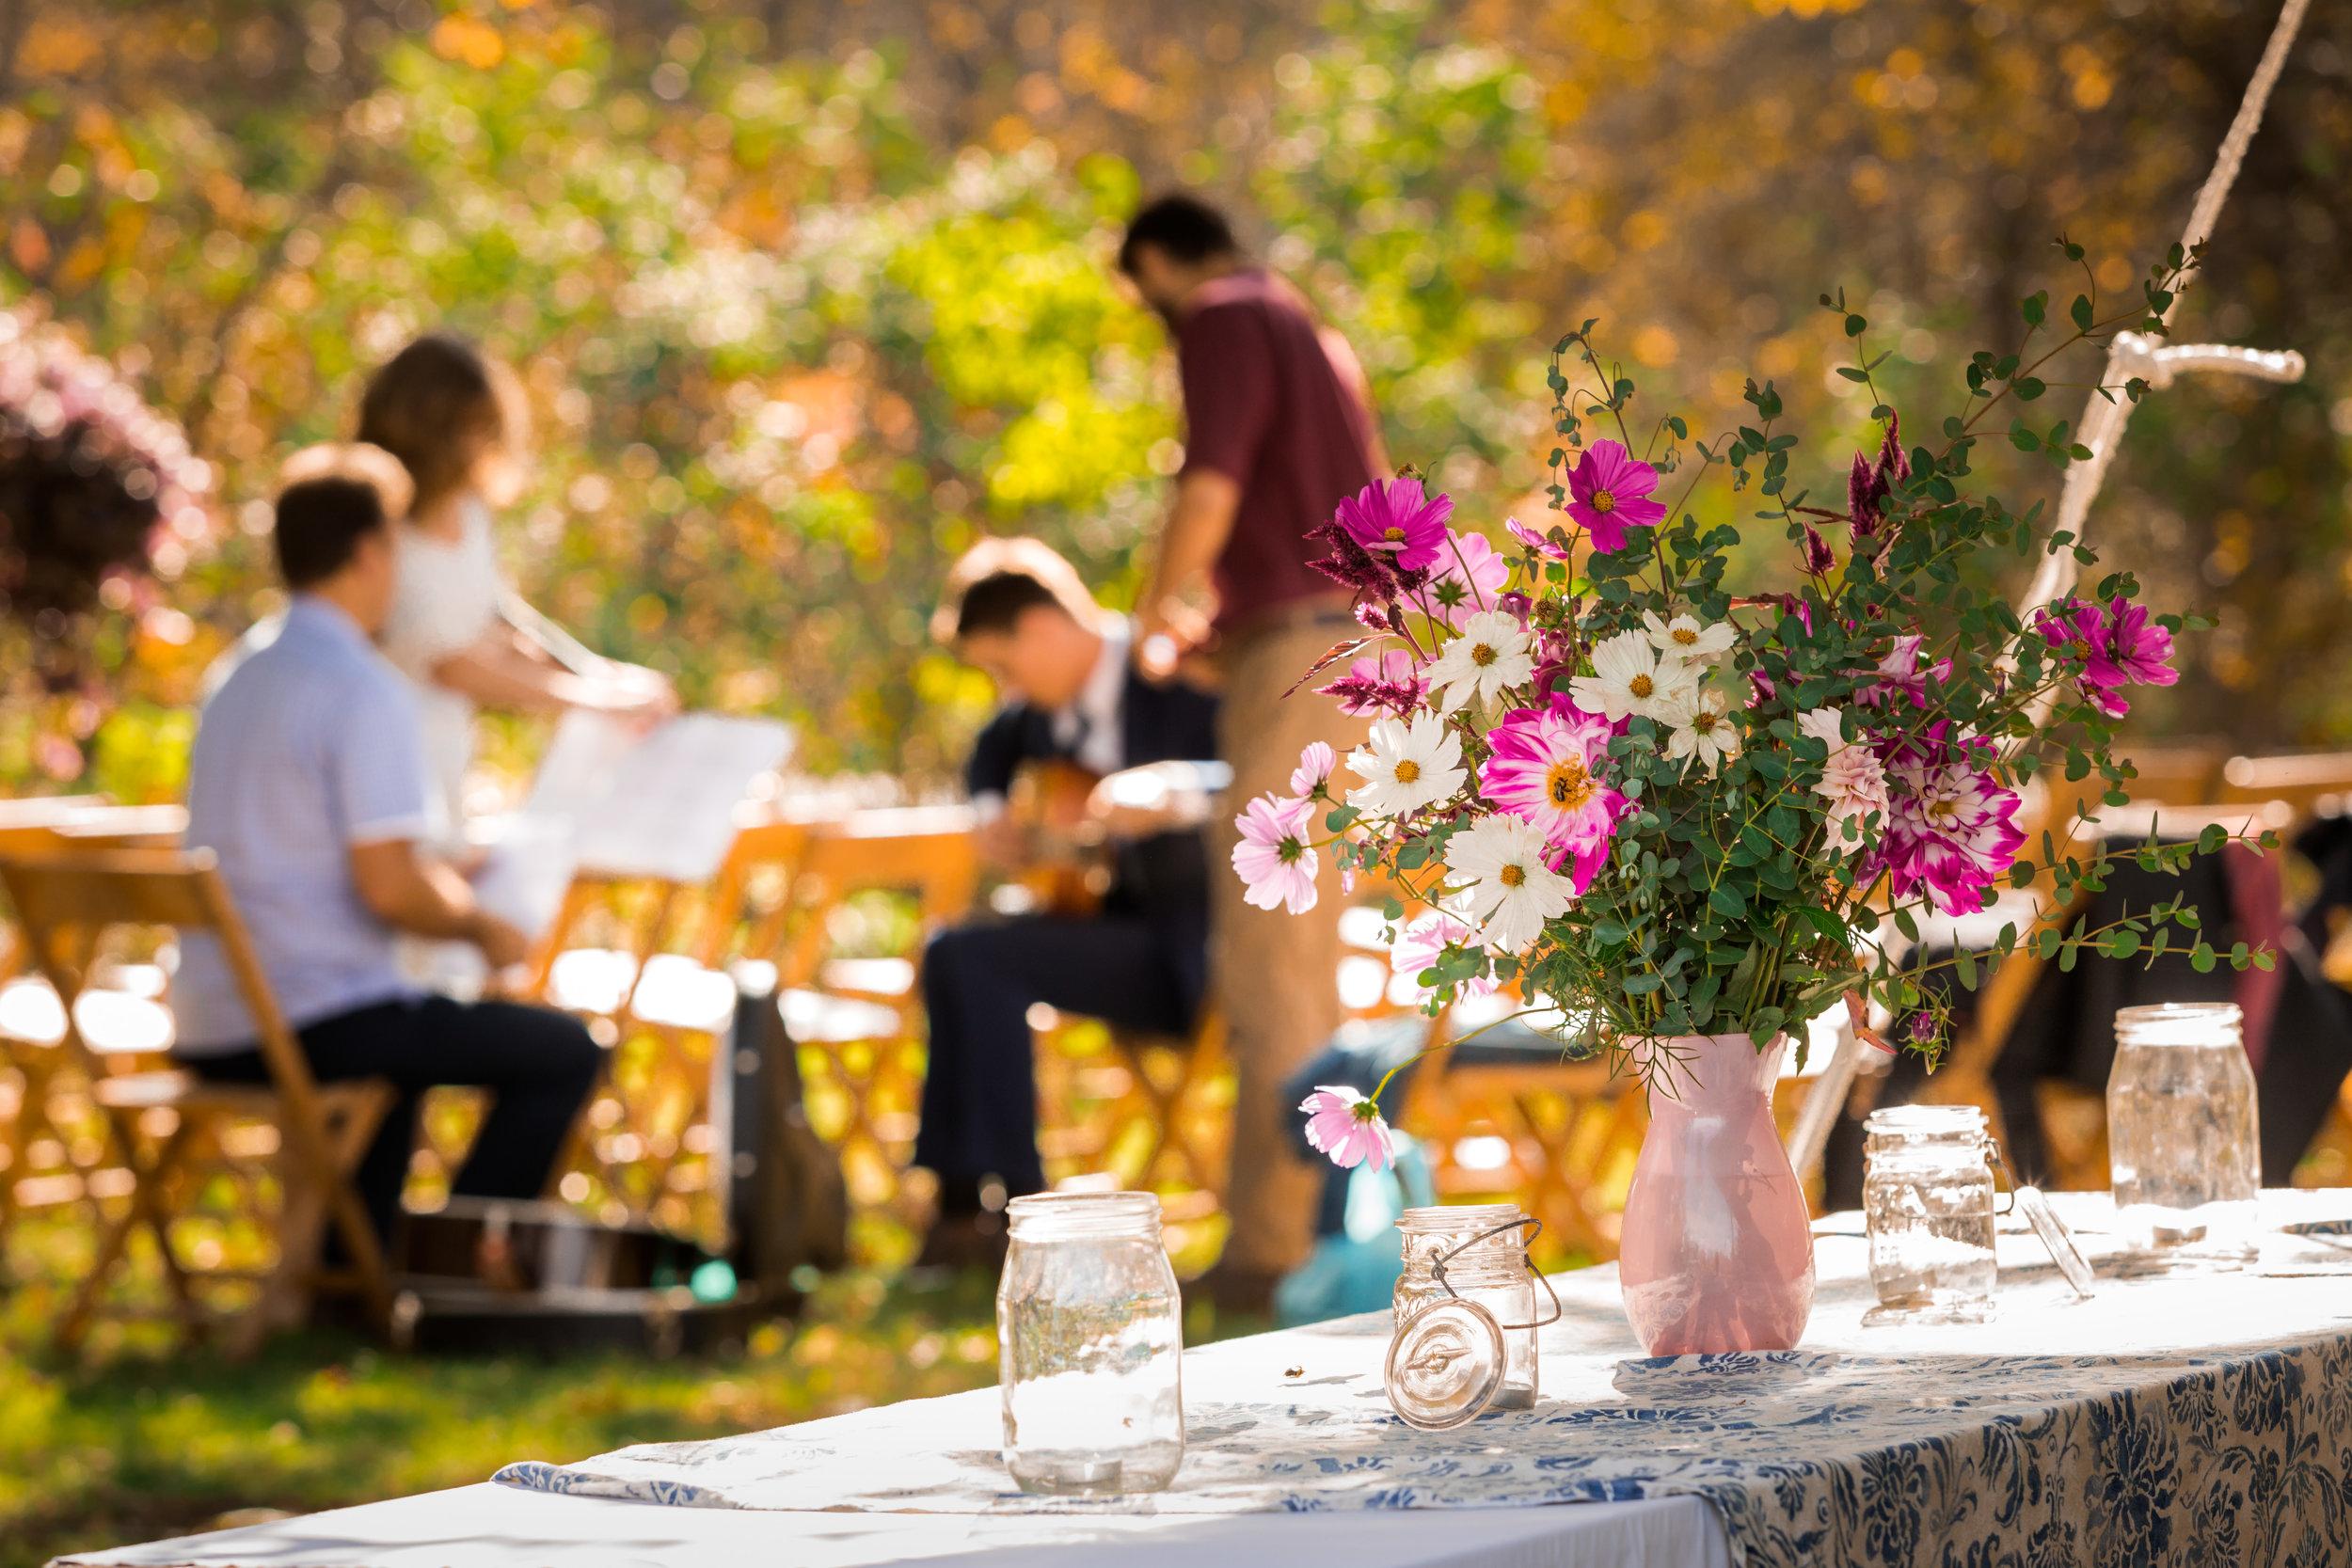 vild-photography-photographer-tahoe-intimate-wedding-adventure-van-abigail-3.jpg